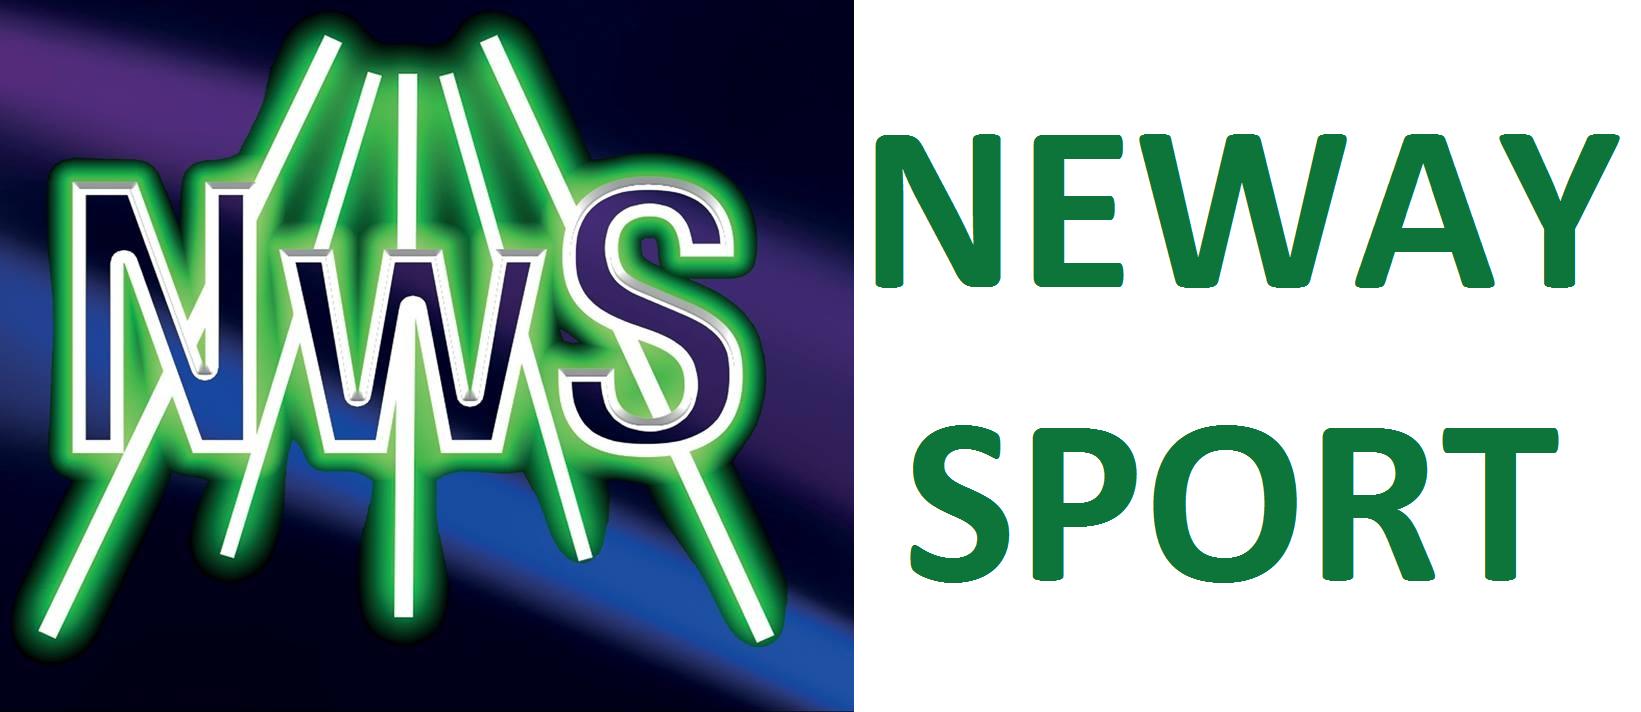 Neway Sport